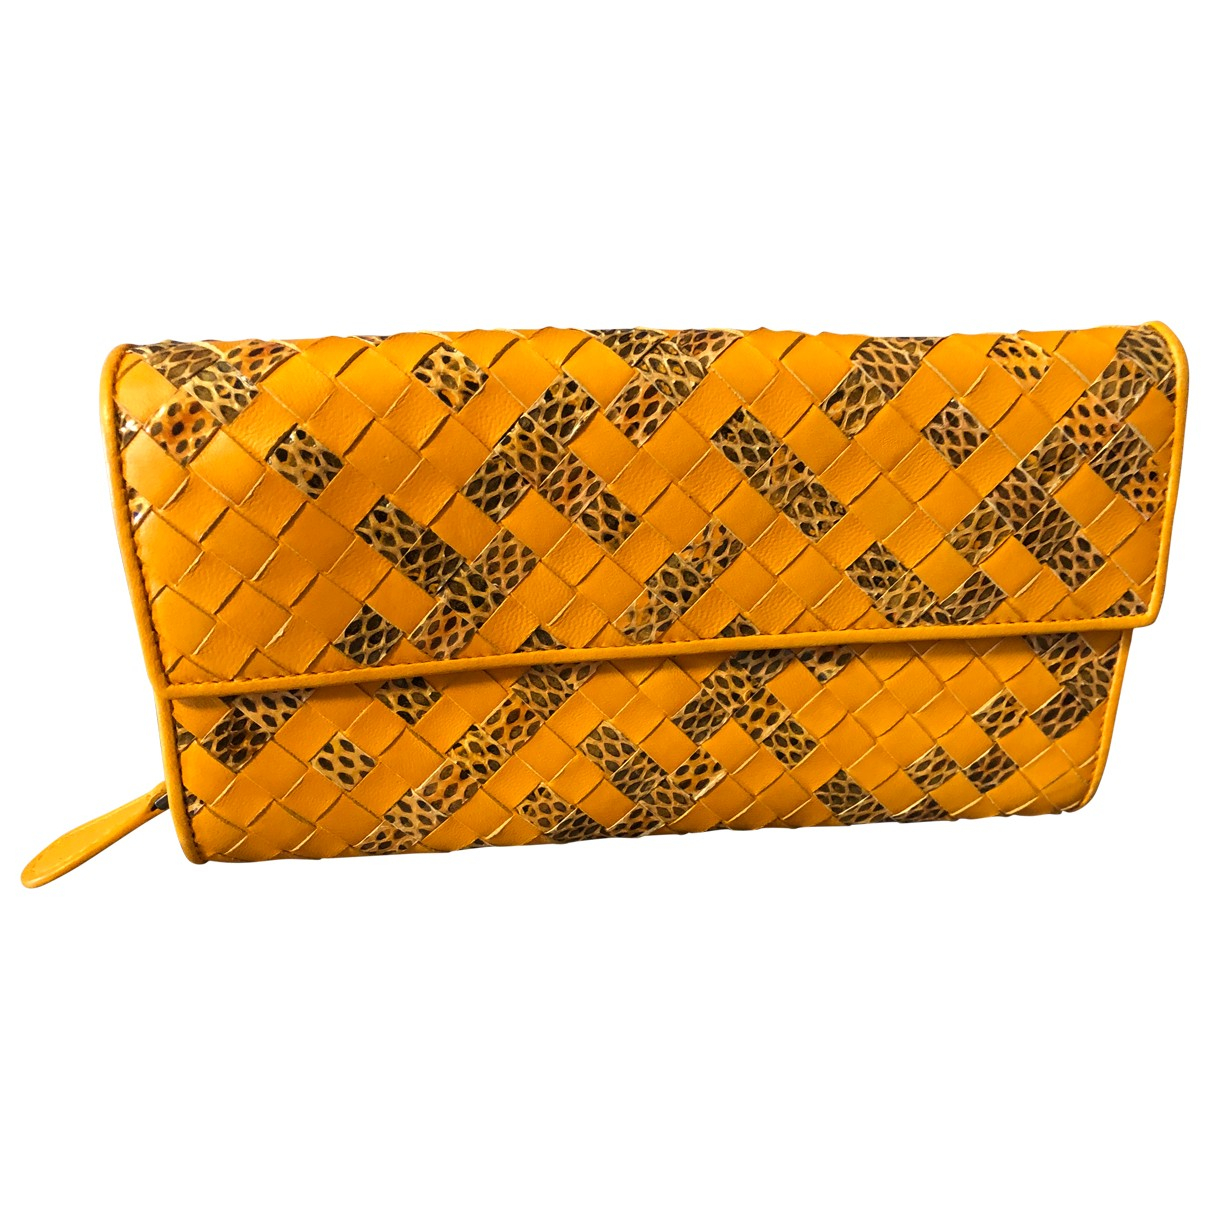 Bottega Veneta - Portefeuille Intrecciato pour femme en cuir - jaune